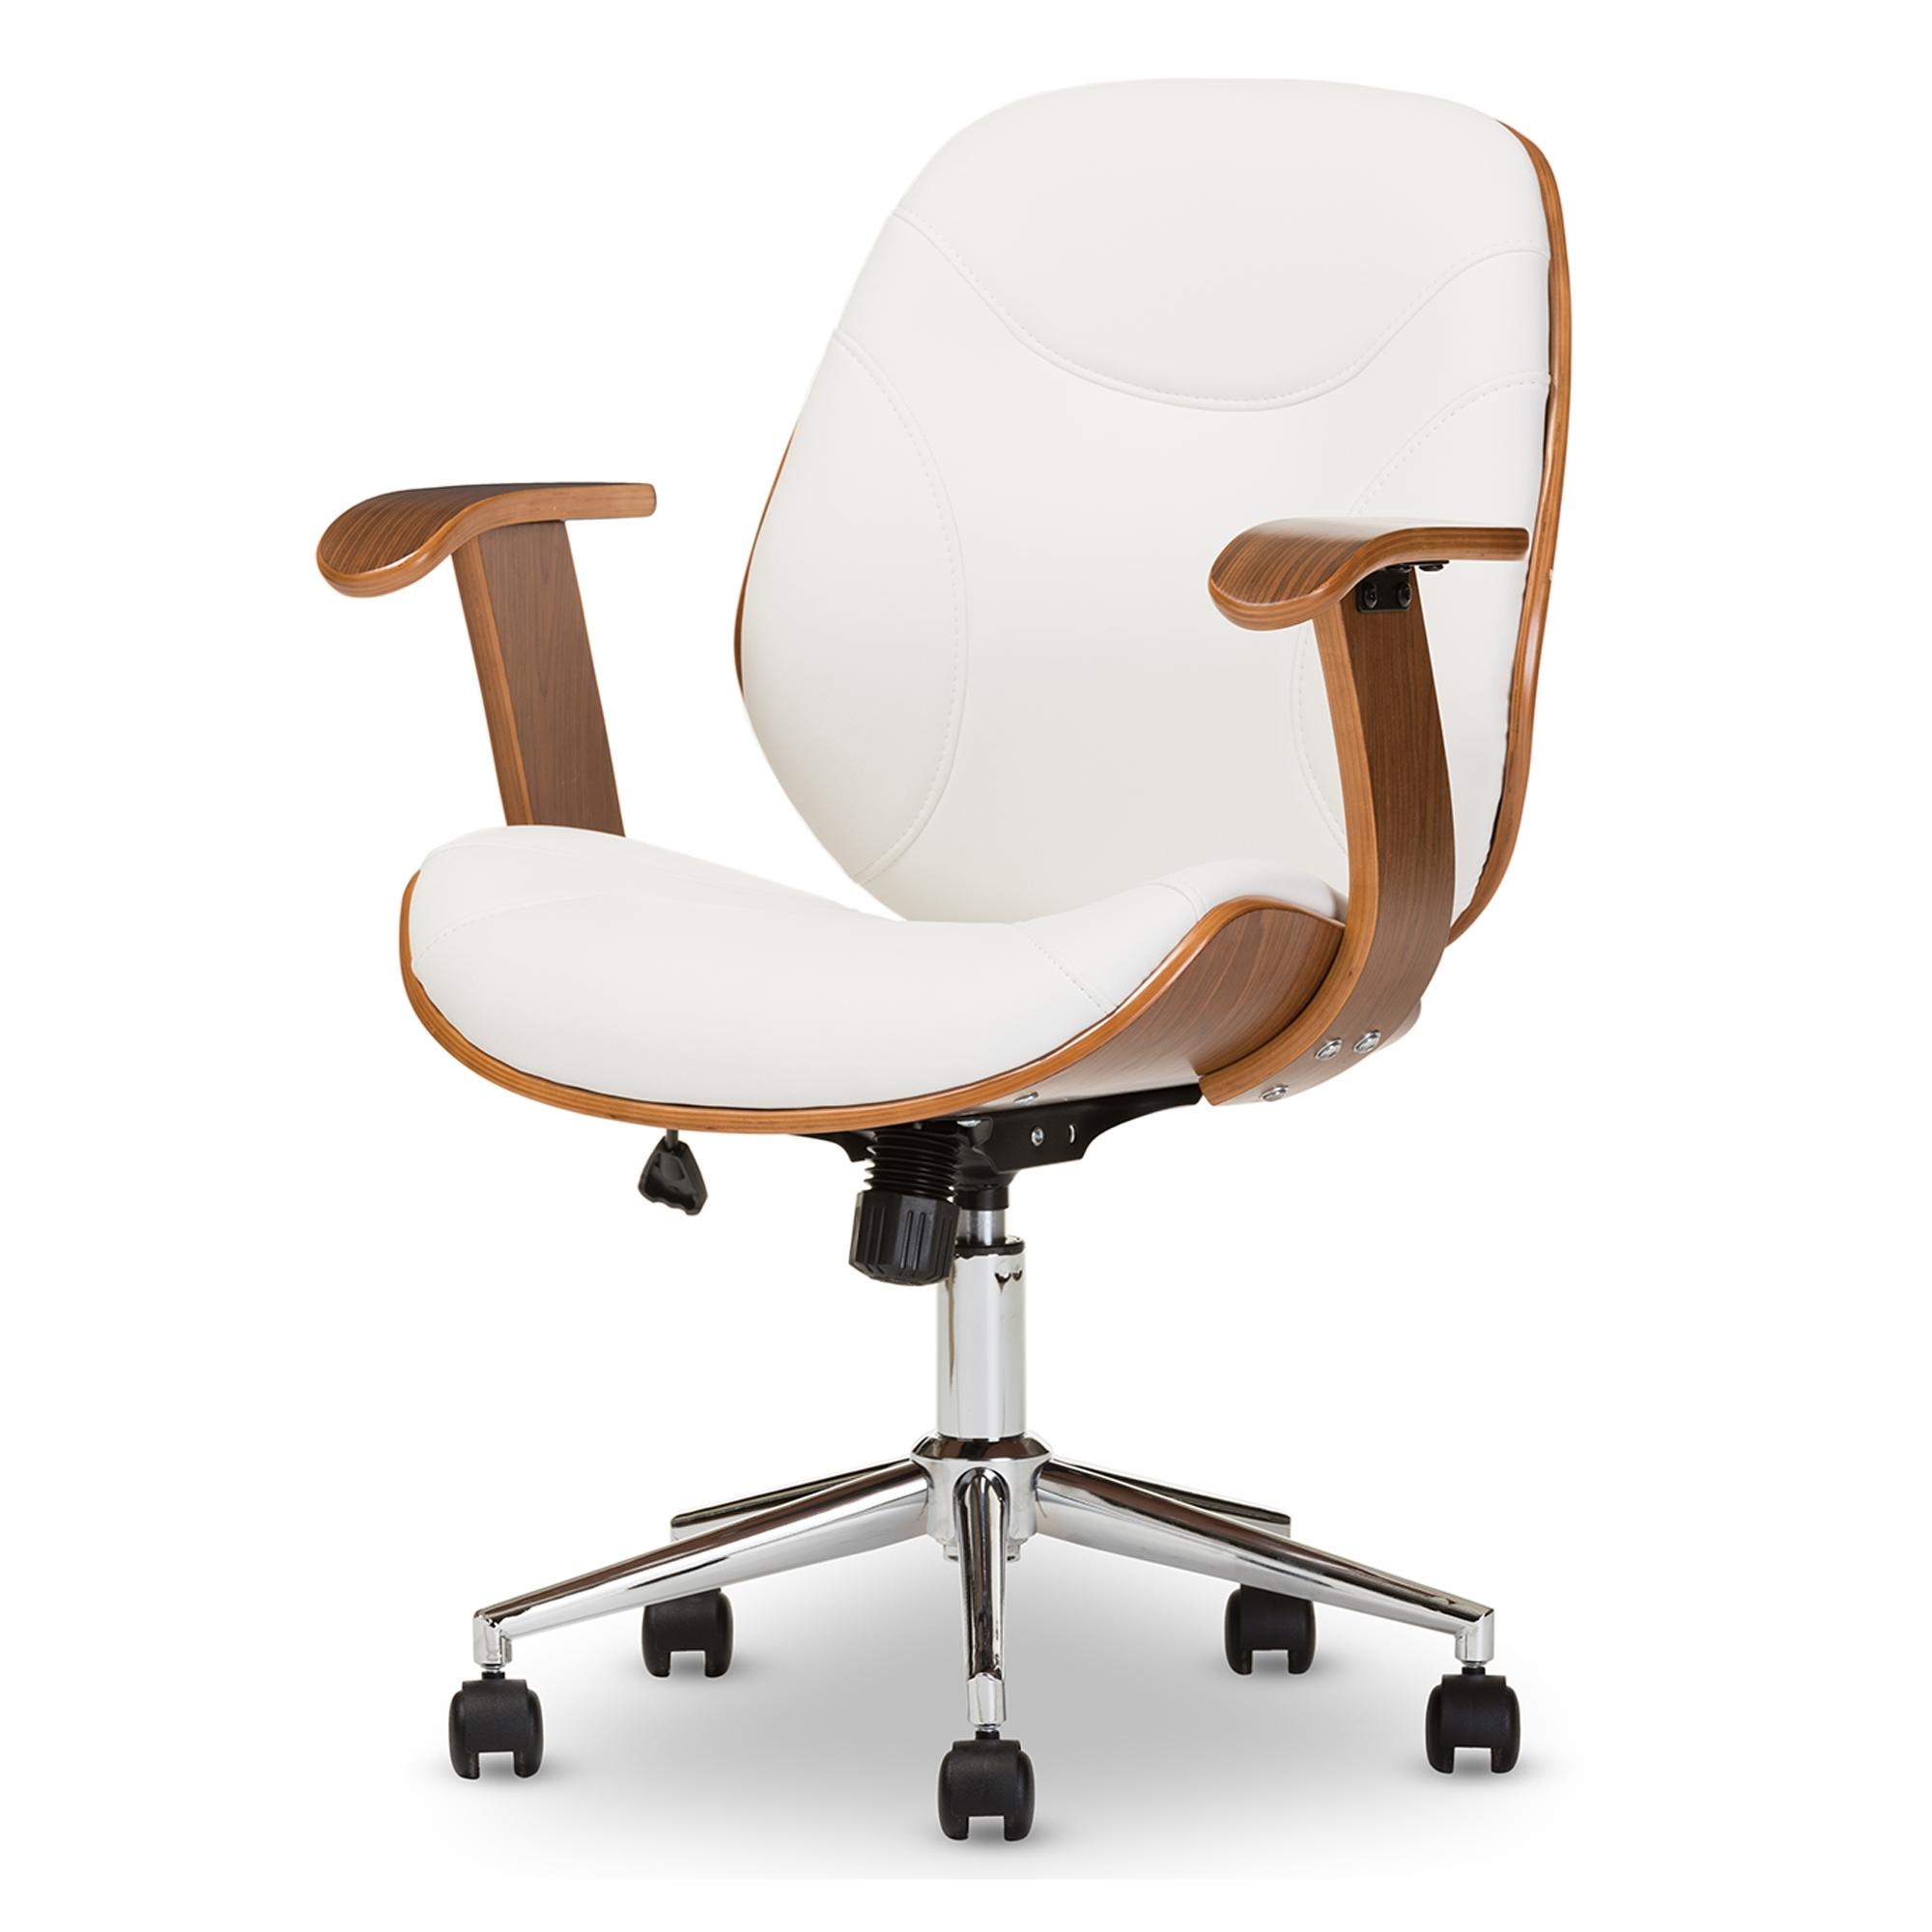 white walnut office furniture. baxton studio rathburn modern and contemporary white walnut office chair - iesd-2235- furniture d